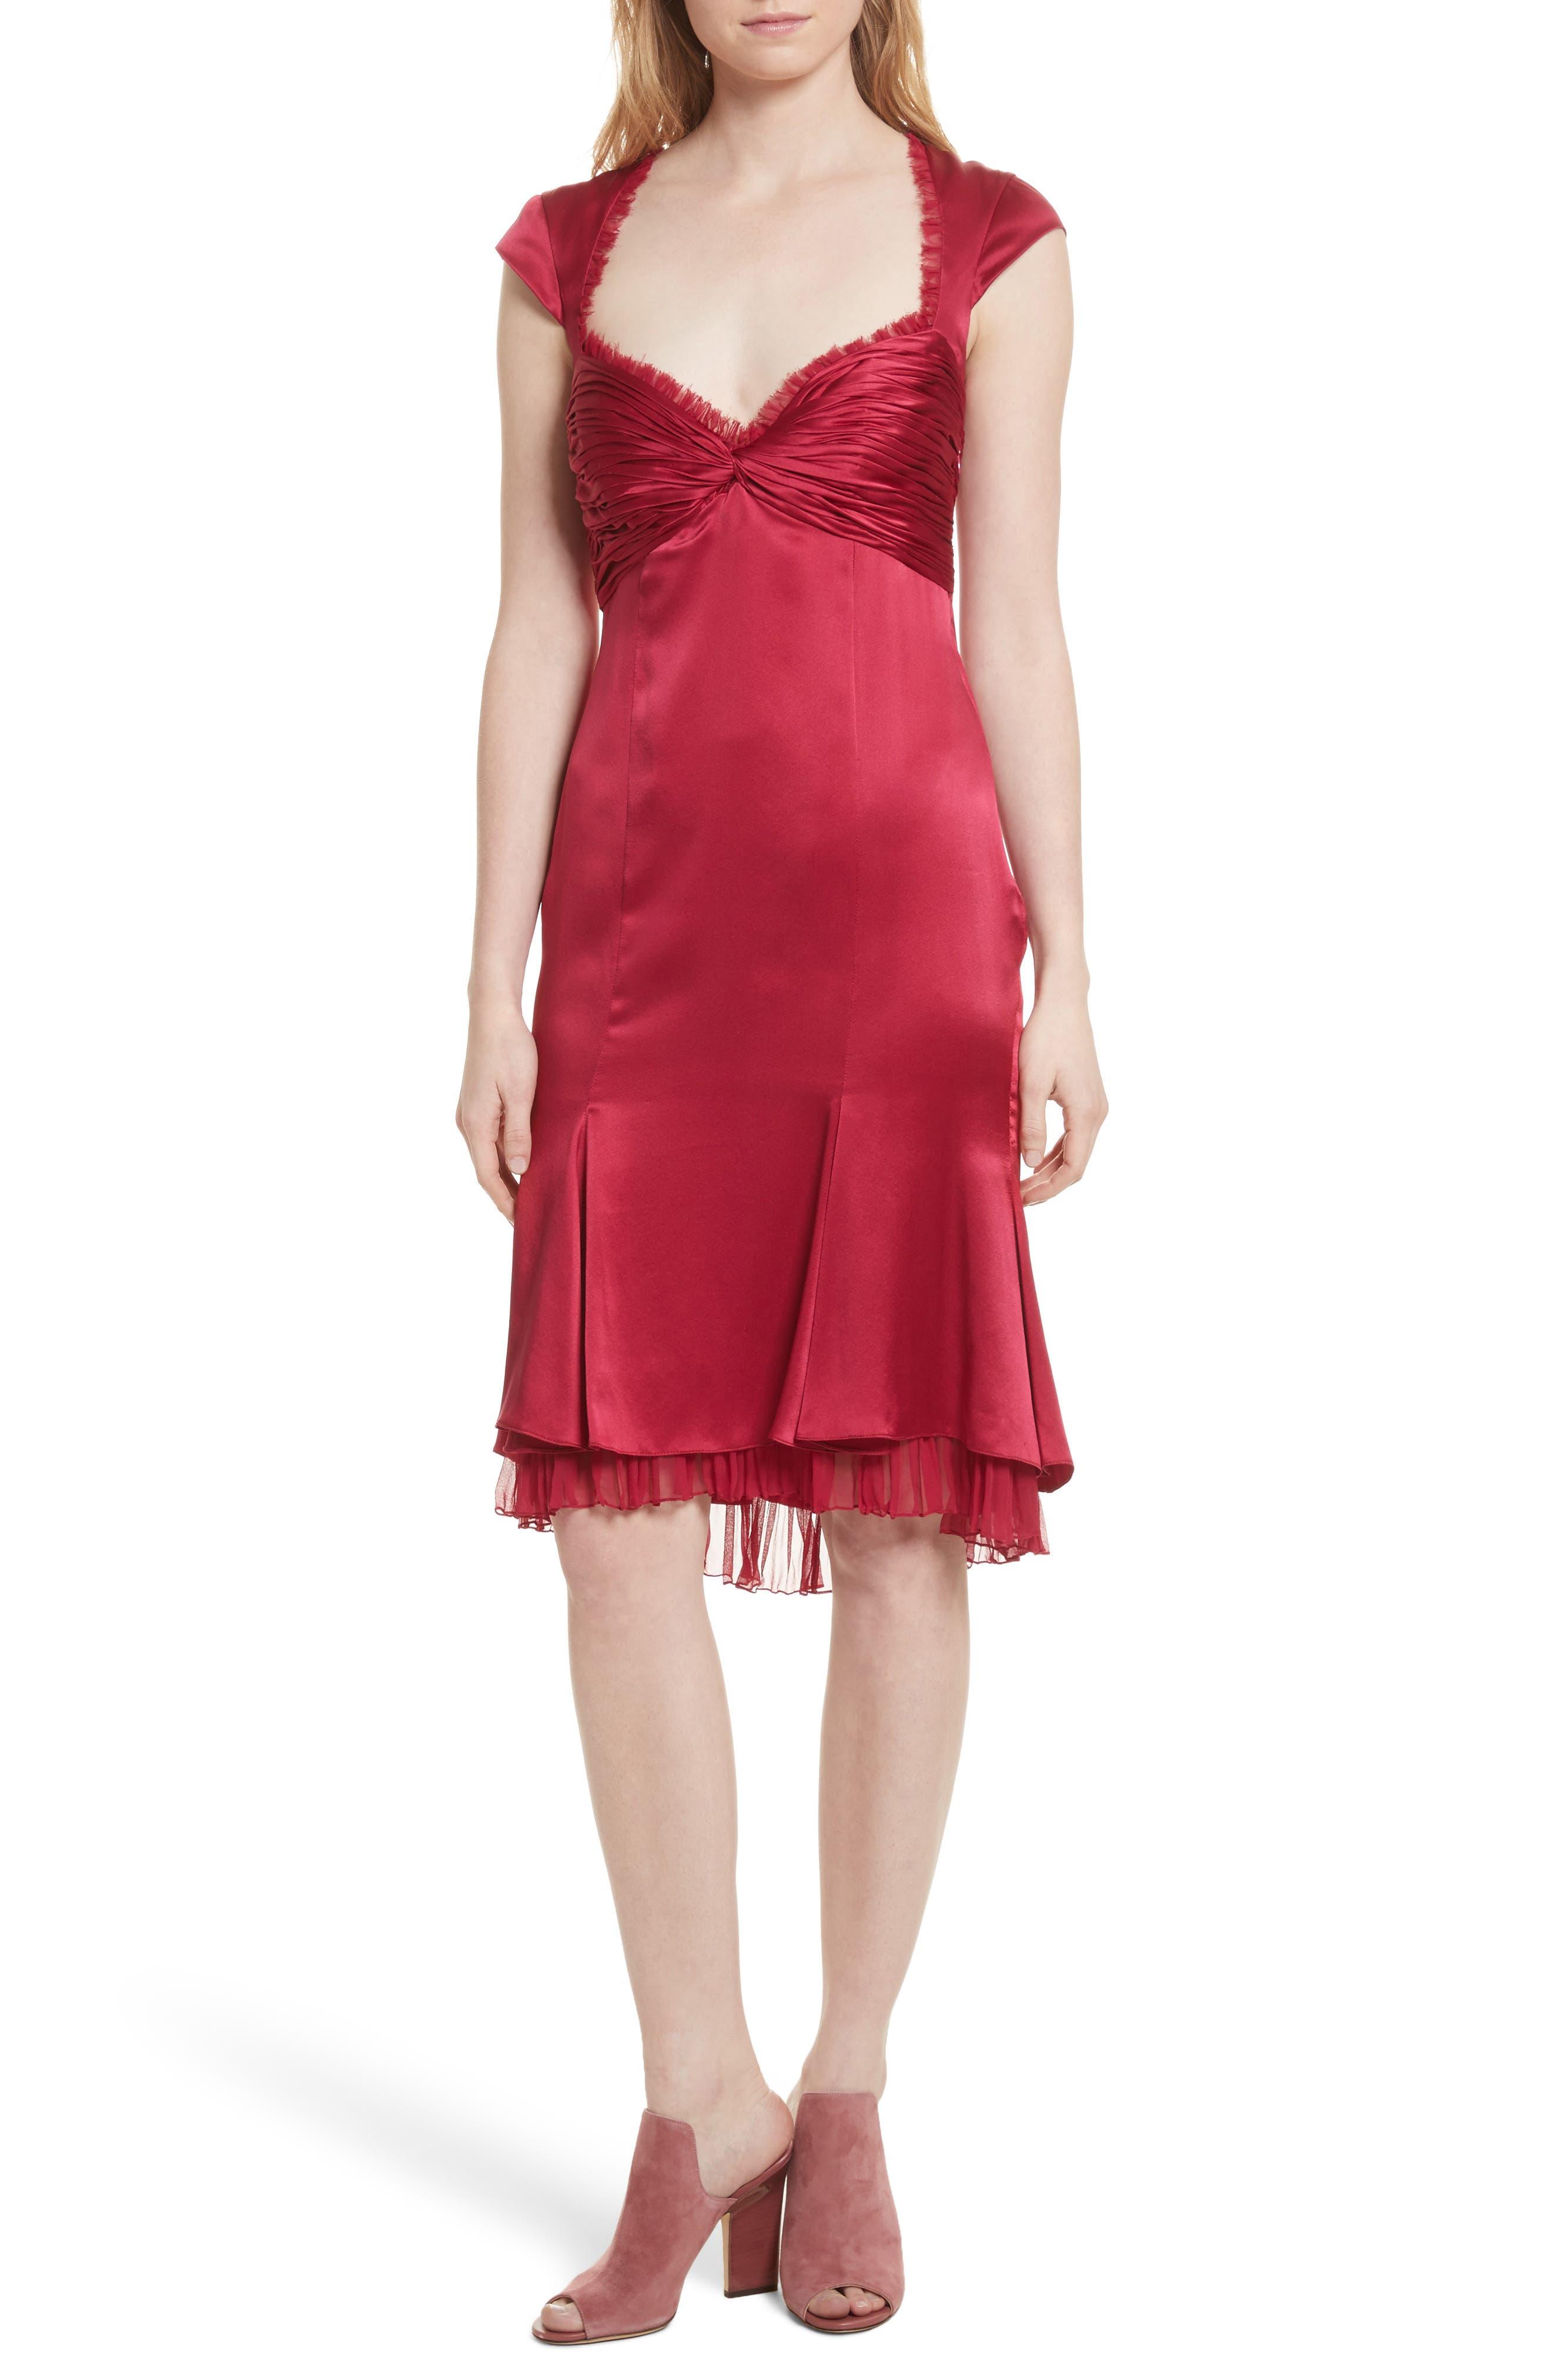 Marnie Satin Dress,                         Main,                         color, Cerise